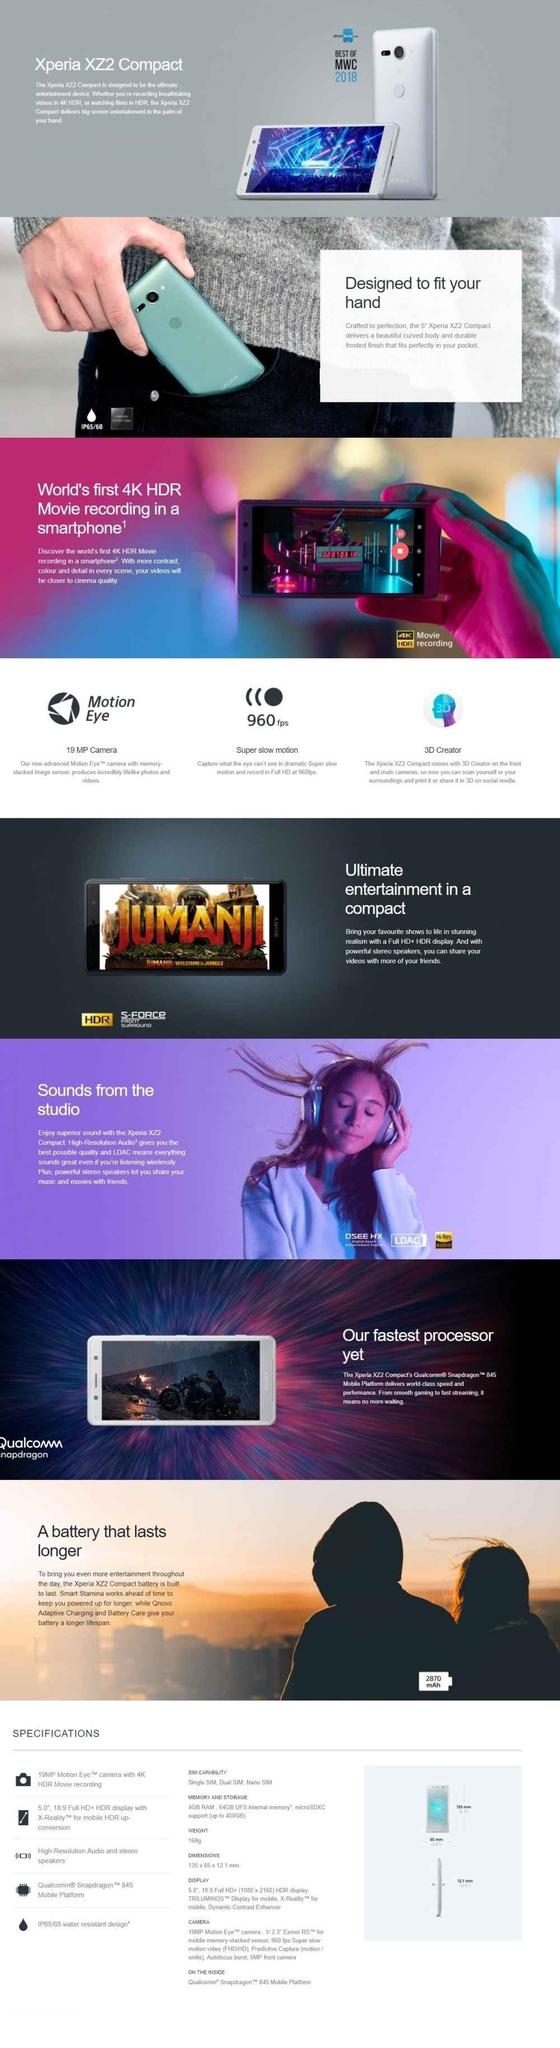 FireShot Capture 294 - Xperia XZ2 Compact – Official Website_ - https___www.sonymobile.com_my_prod.jpg